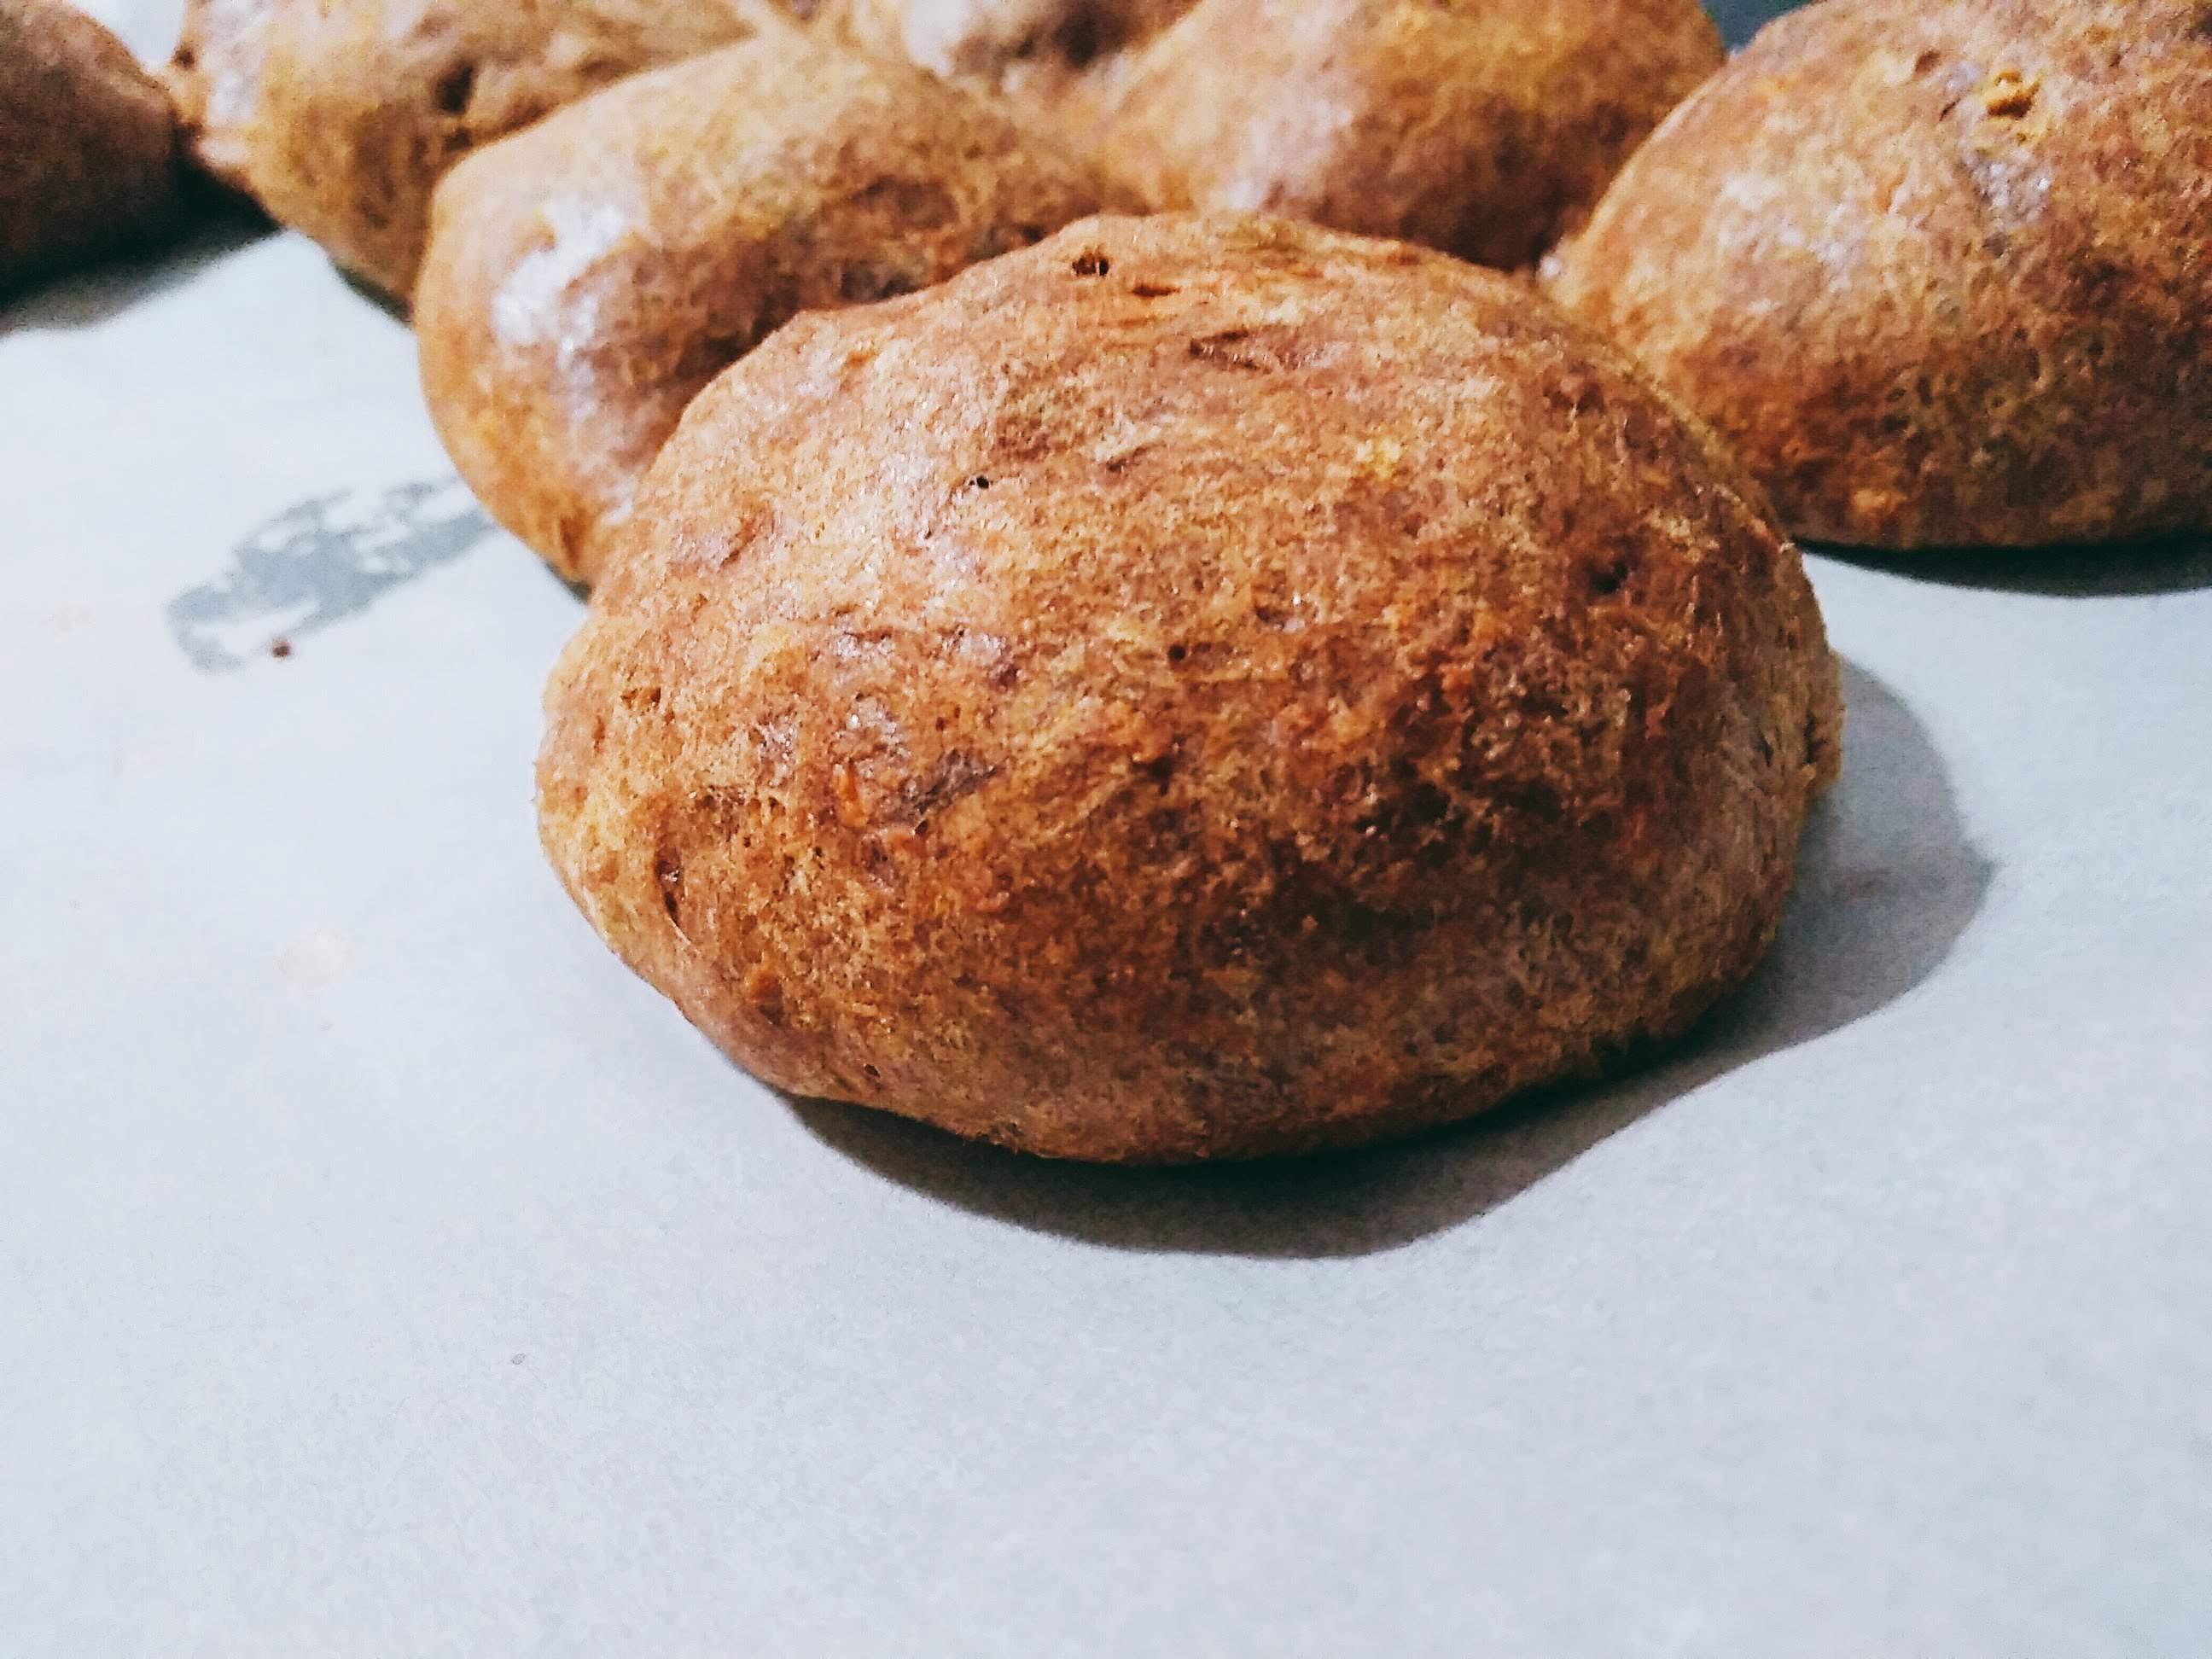 Panini per hamburger Keto: Vegani, Vegetariani, Low Carb, Proteici e senza glutine